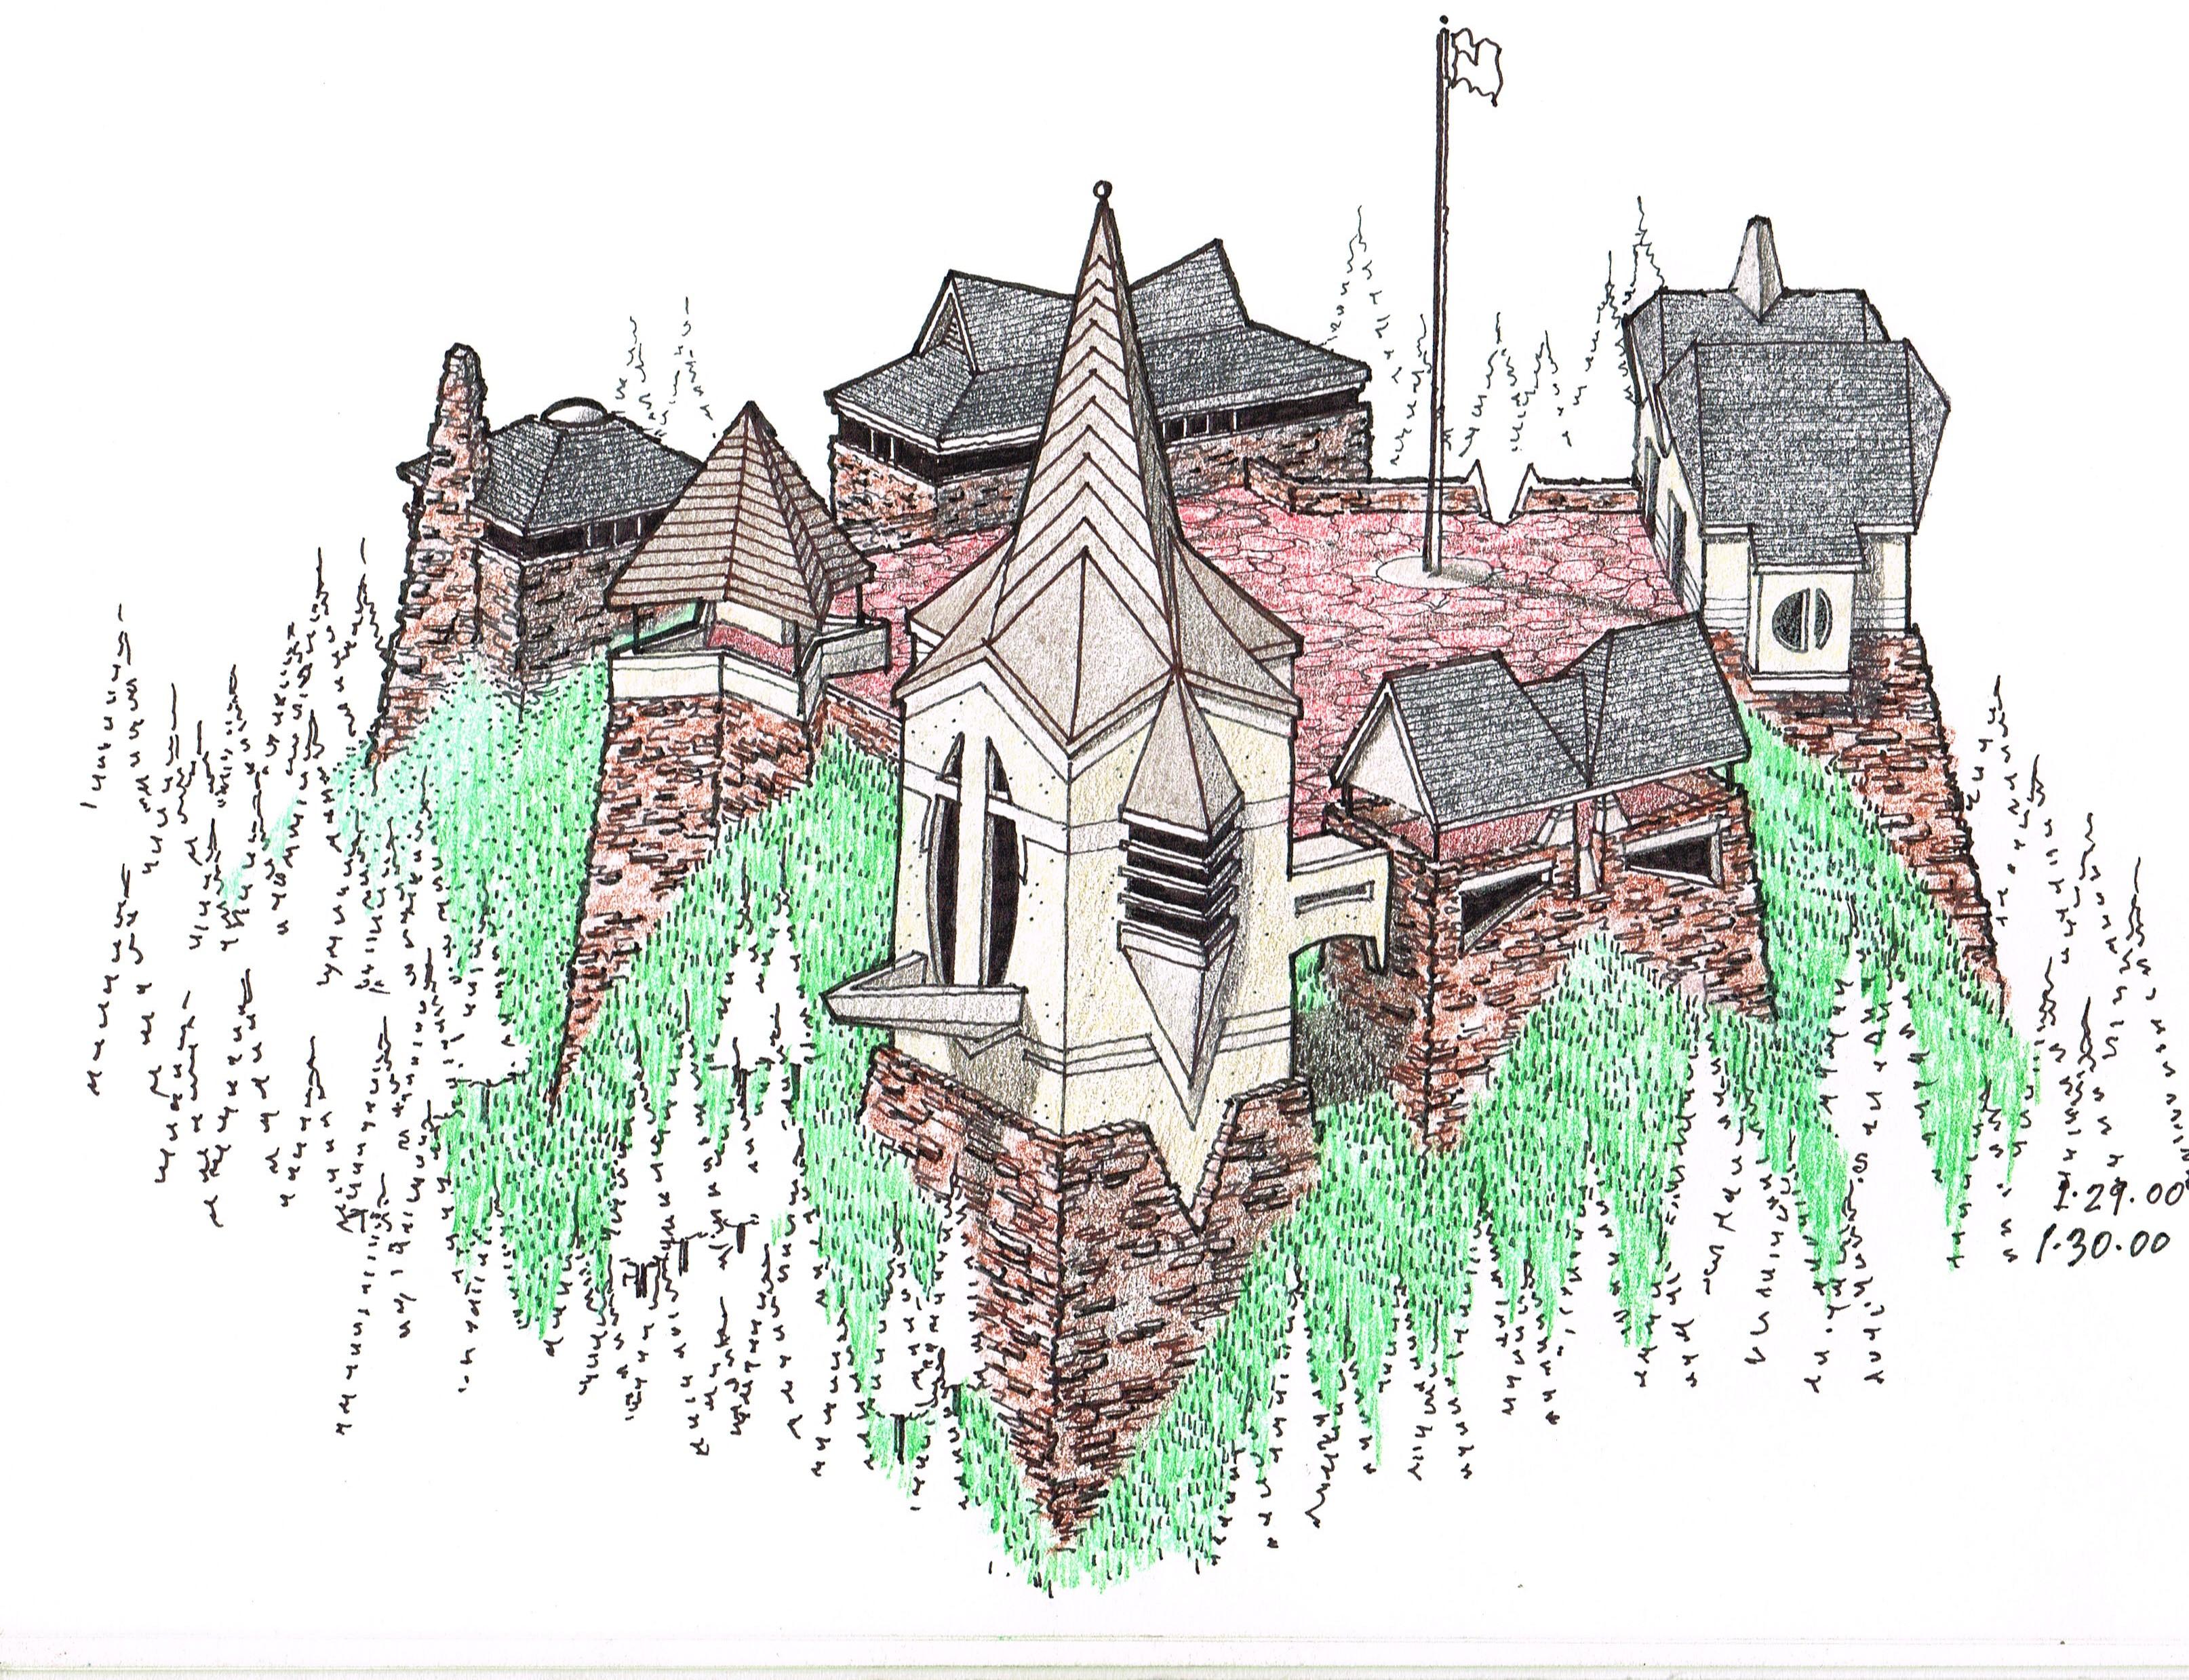 House concept - Hilltop group